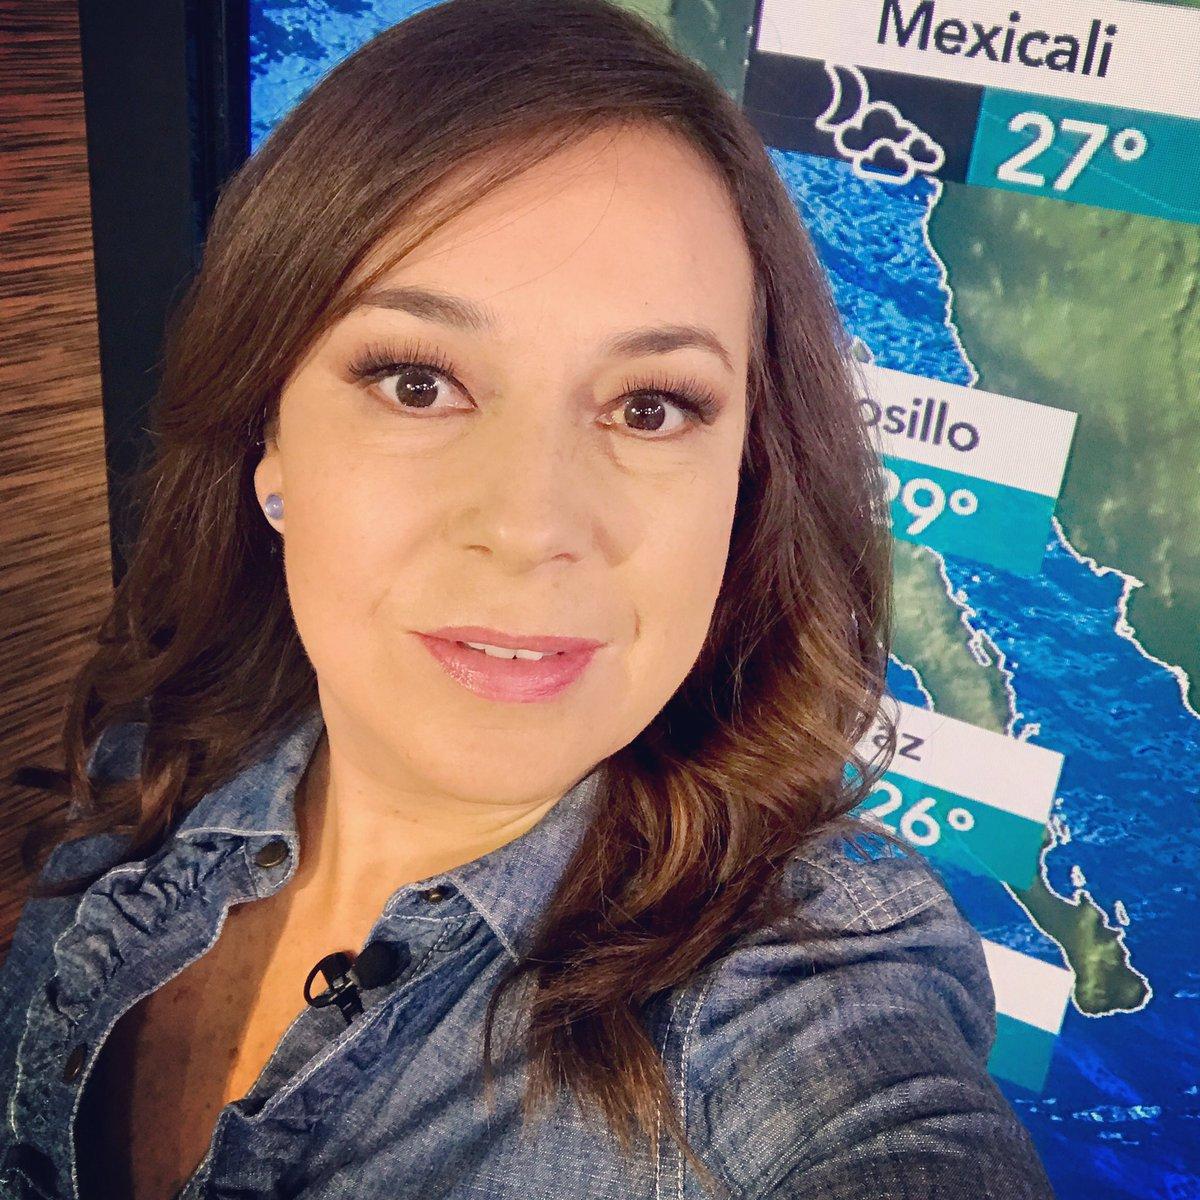 Raquel Méndez Avalos On Twitter Ya Mucho Mejor Del Ojo Con